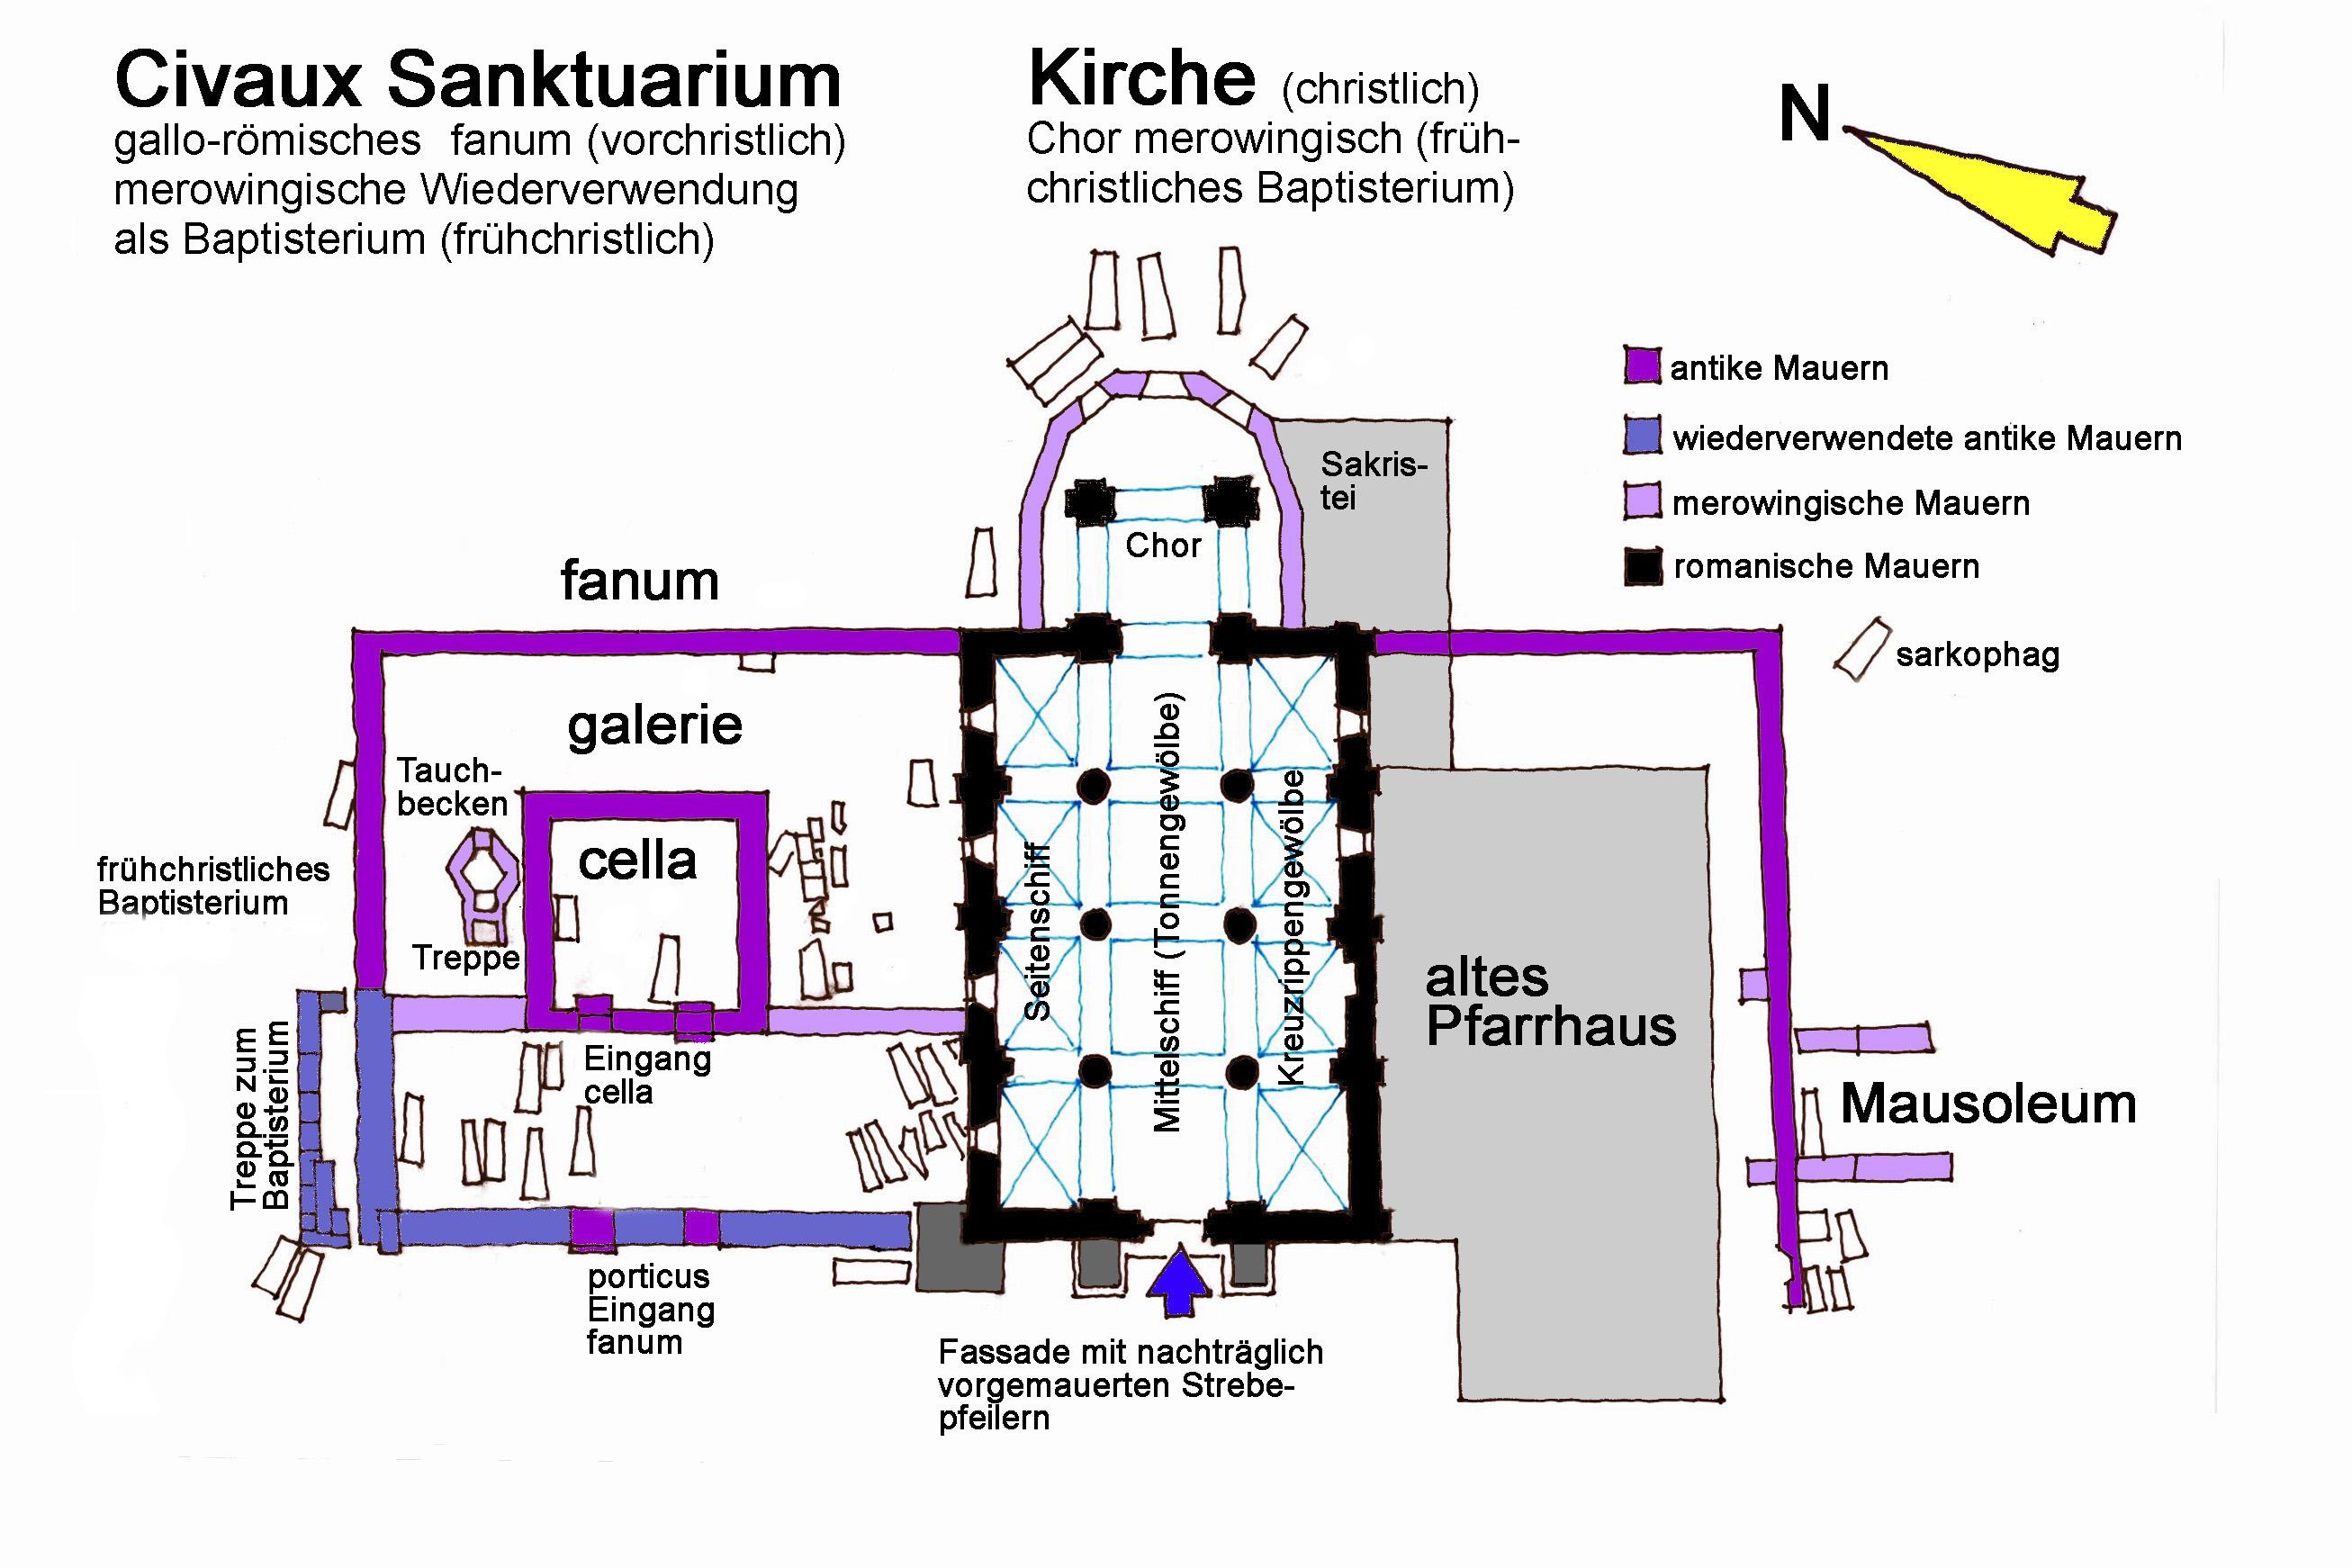 File:F08.Civaux.Sanktuarium.Kirche.Grundriss.0001.6.jpg ...